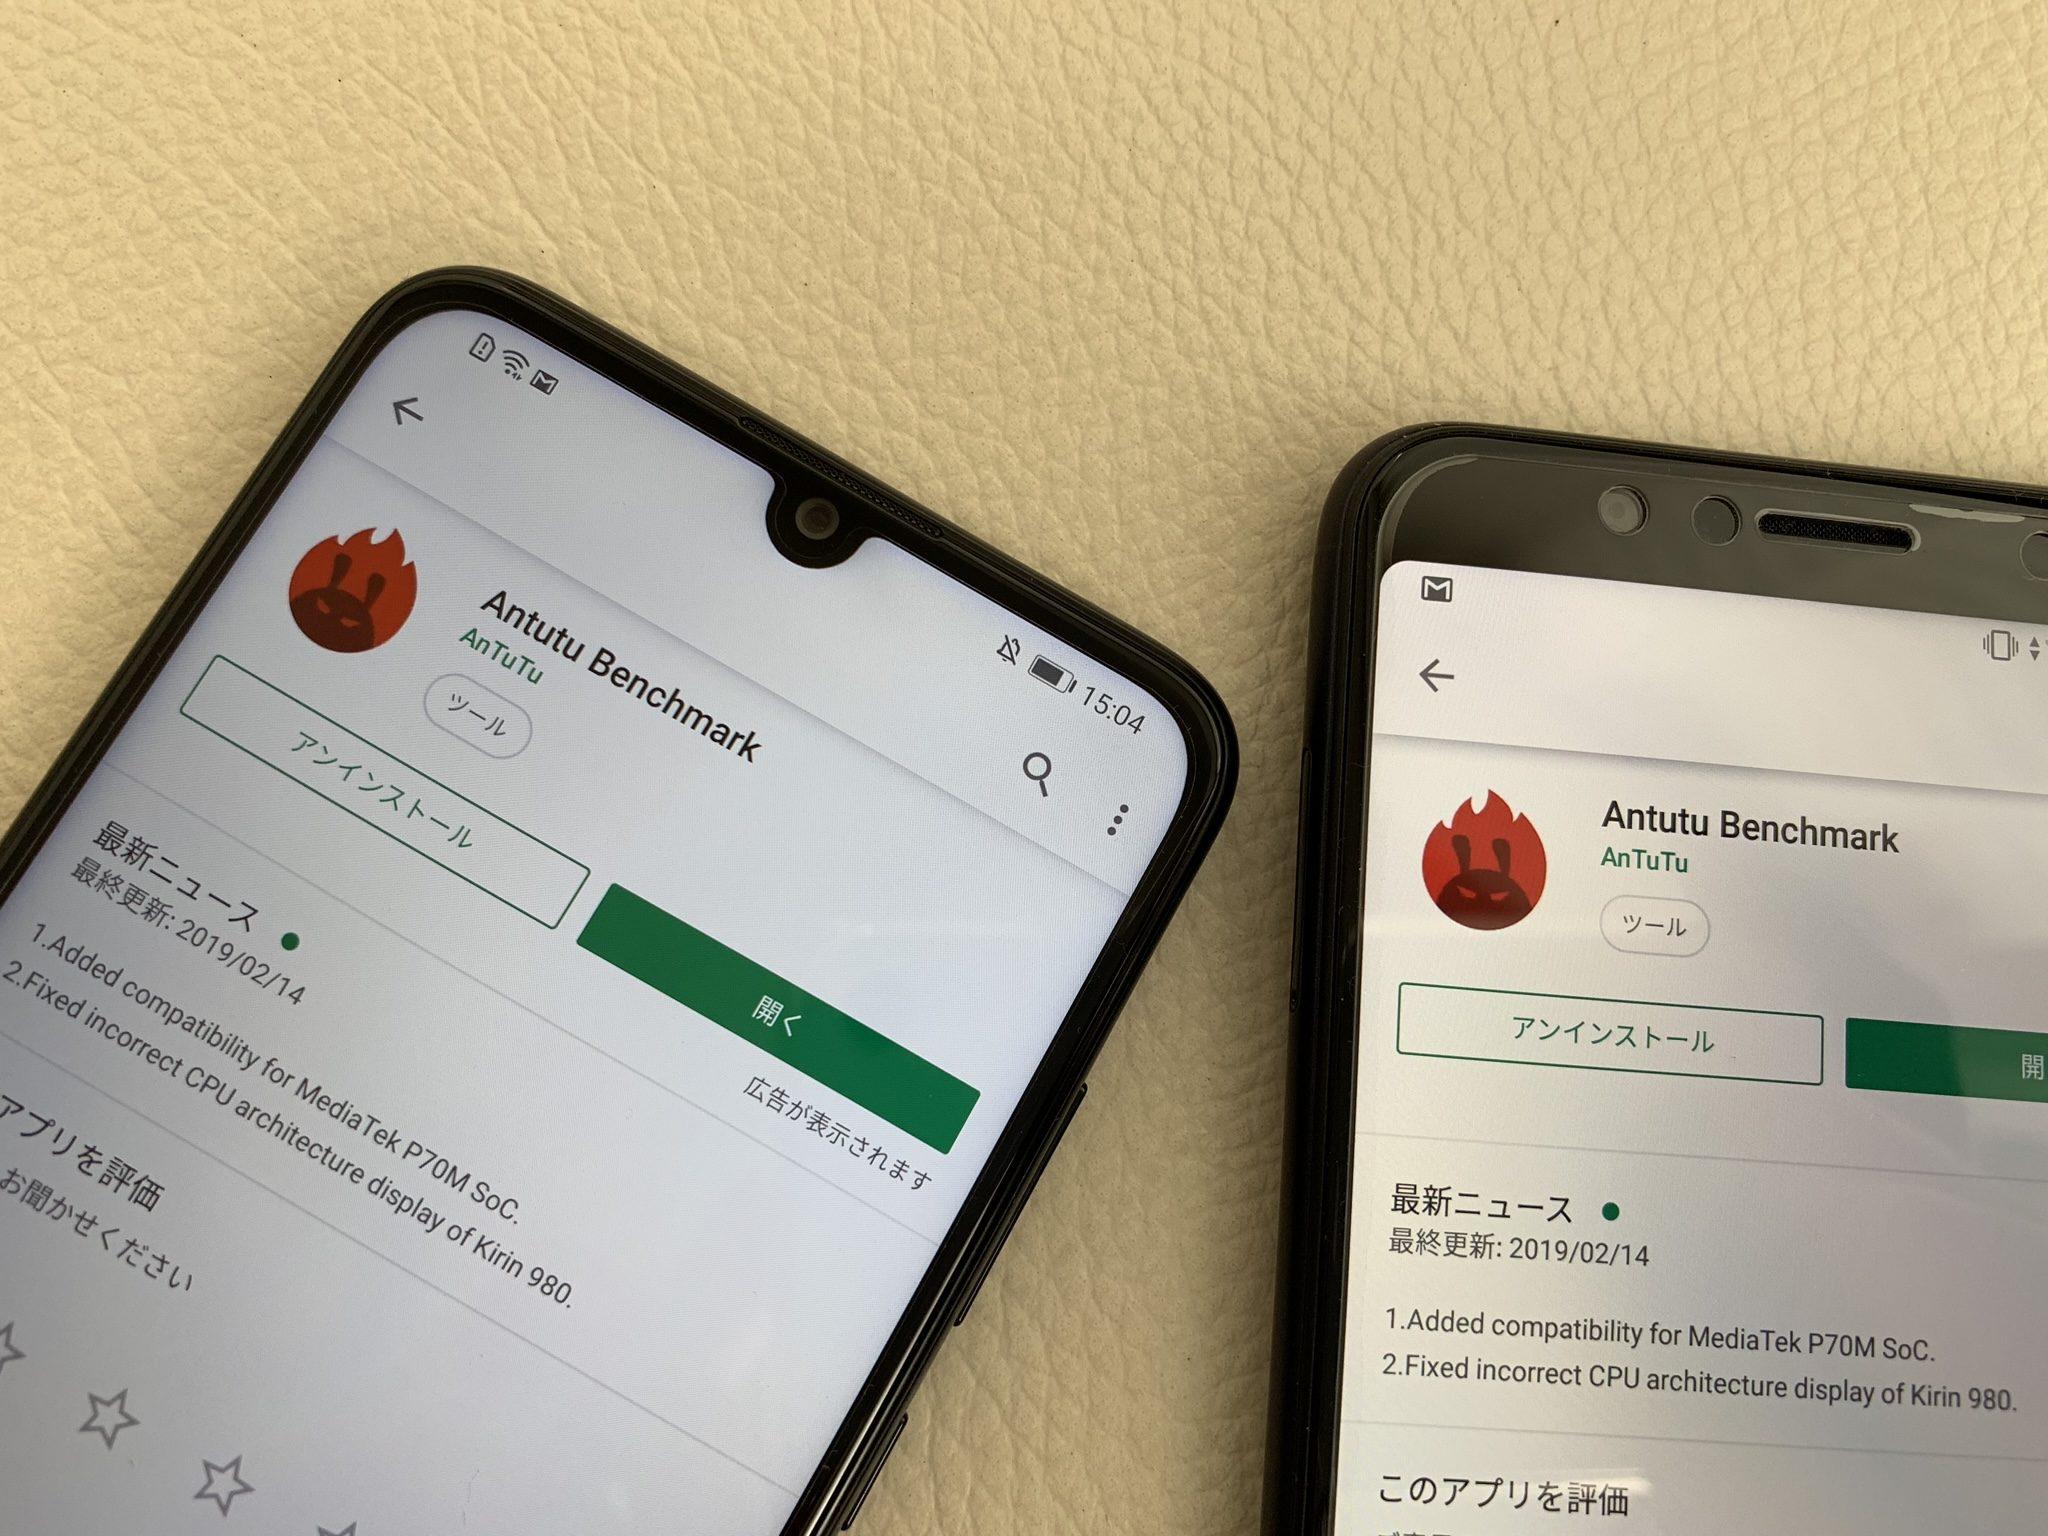 nova lite 3とZenfone Max Pro M1のantutu比較